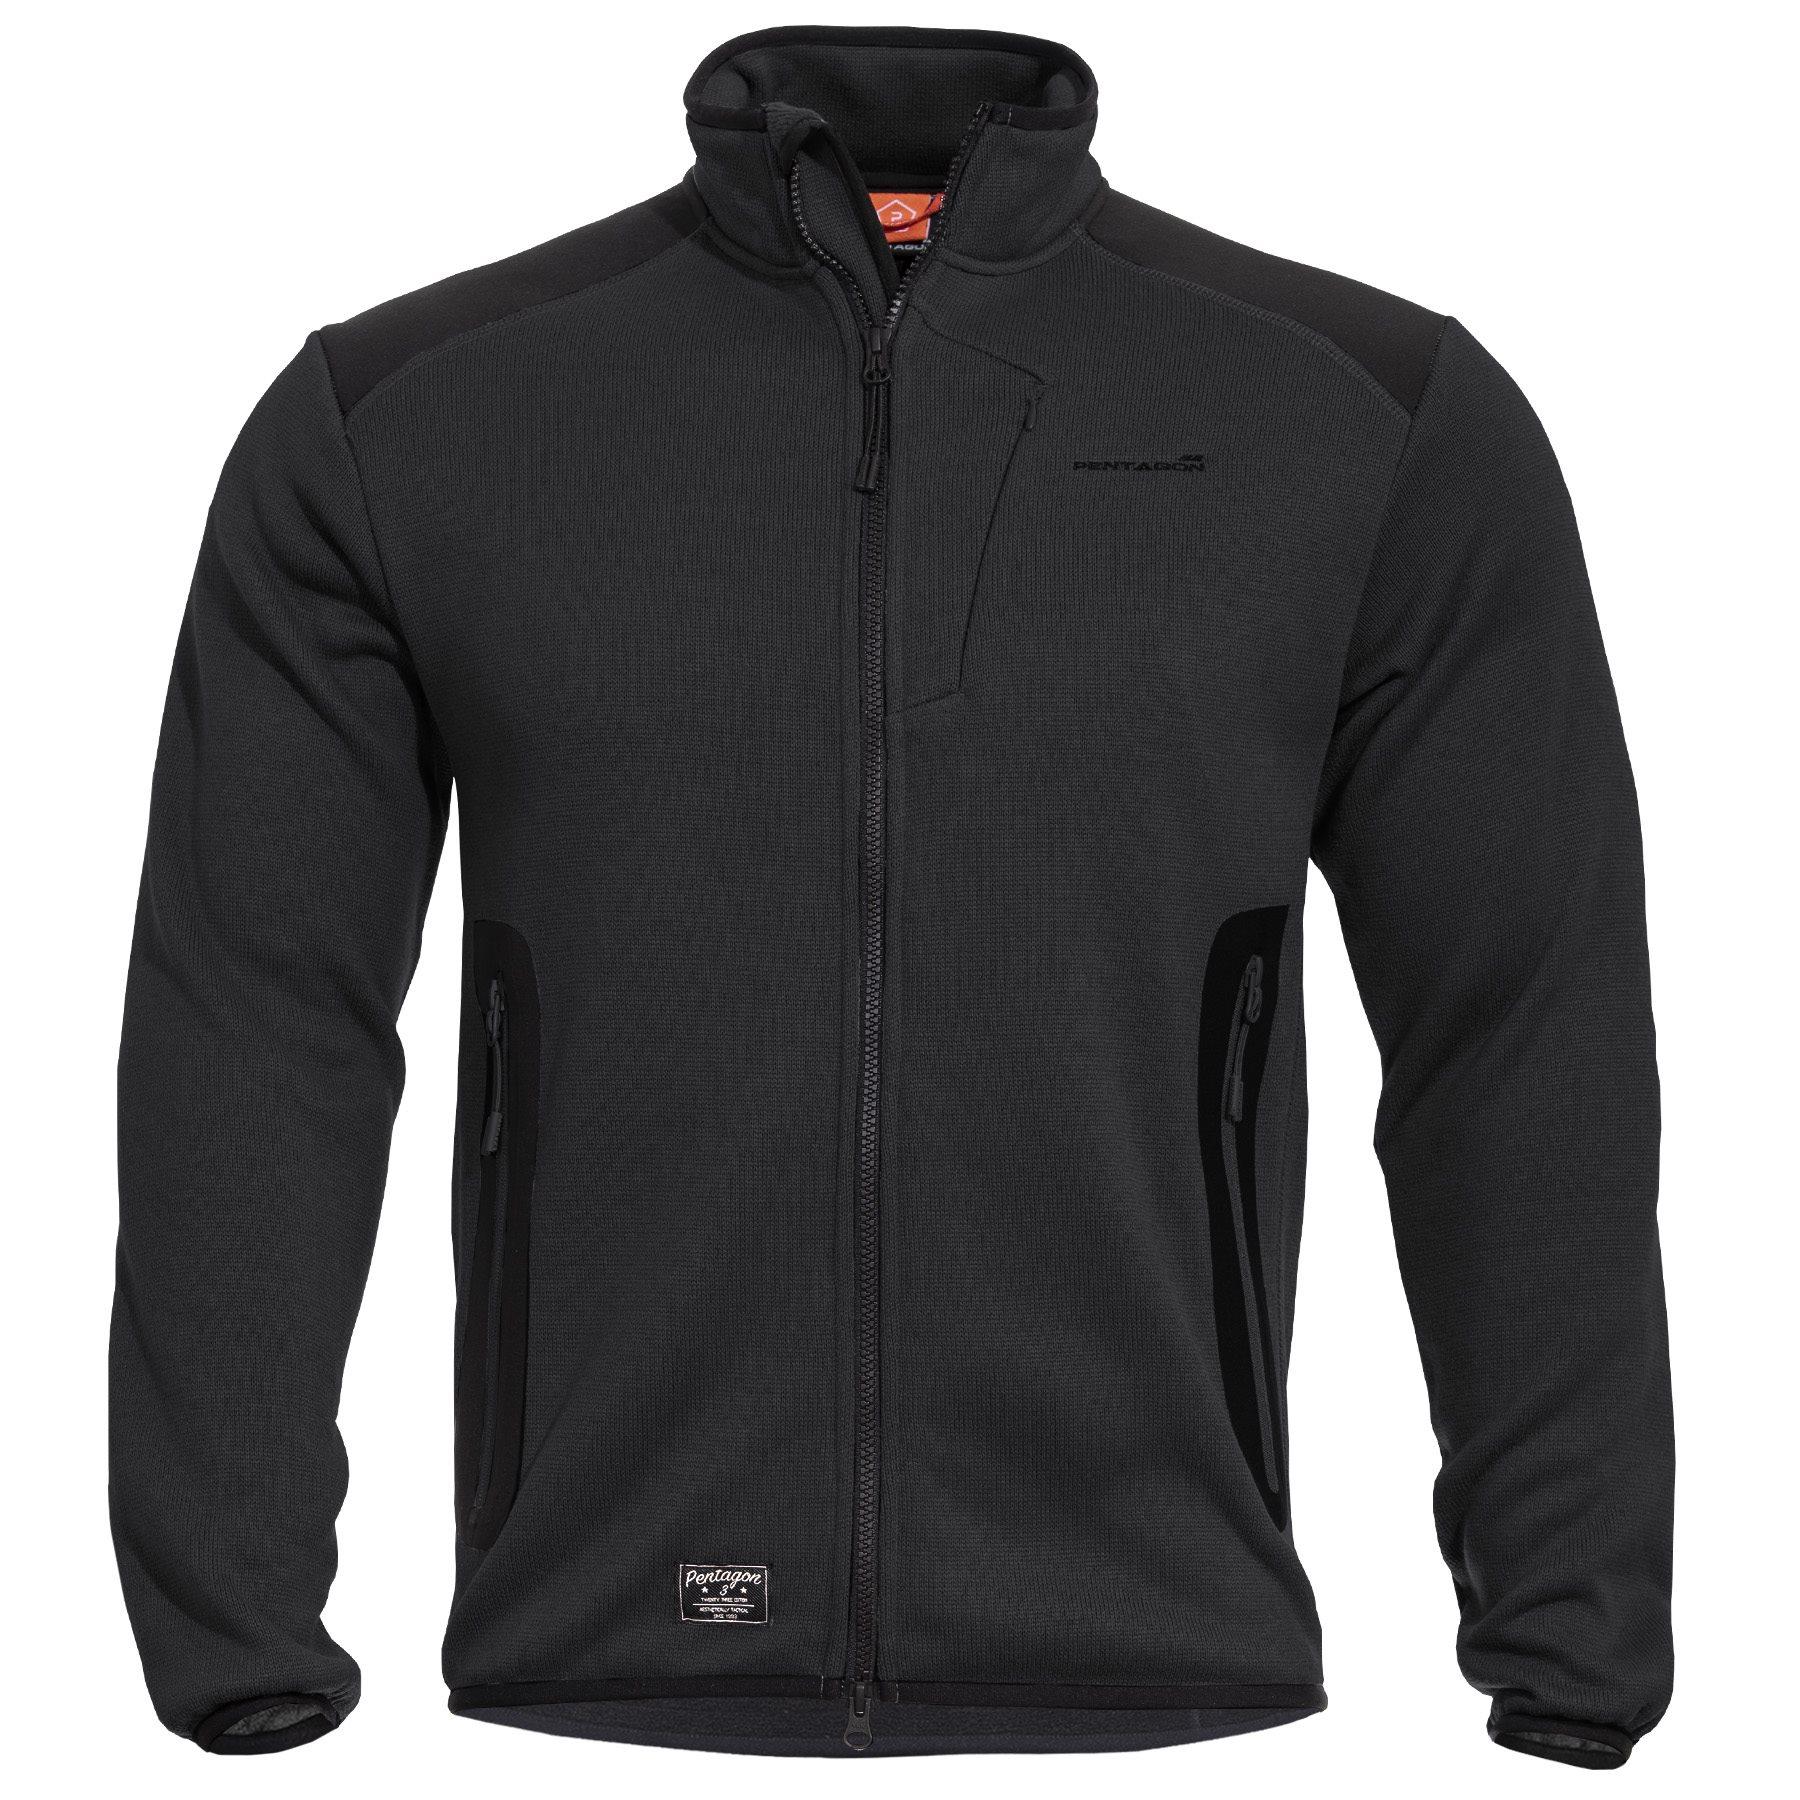 AMINTOR Fleece Sweater BLACK PENTAGON K08028-01 L-11